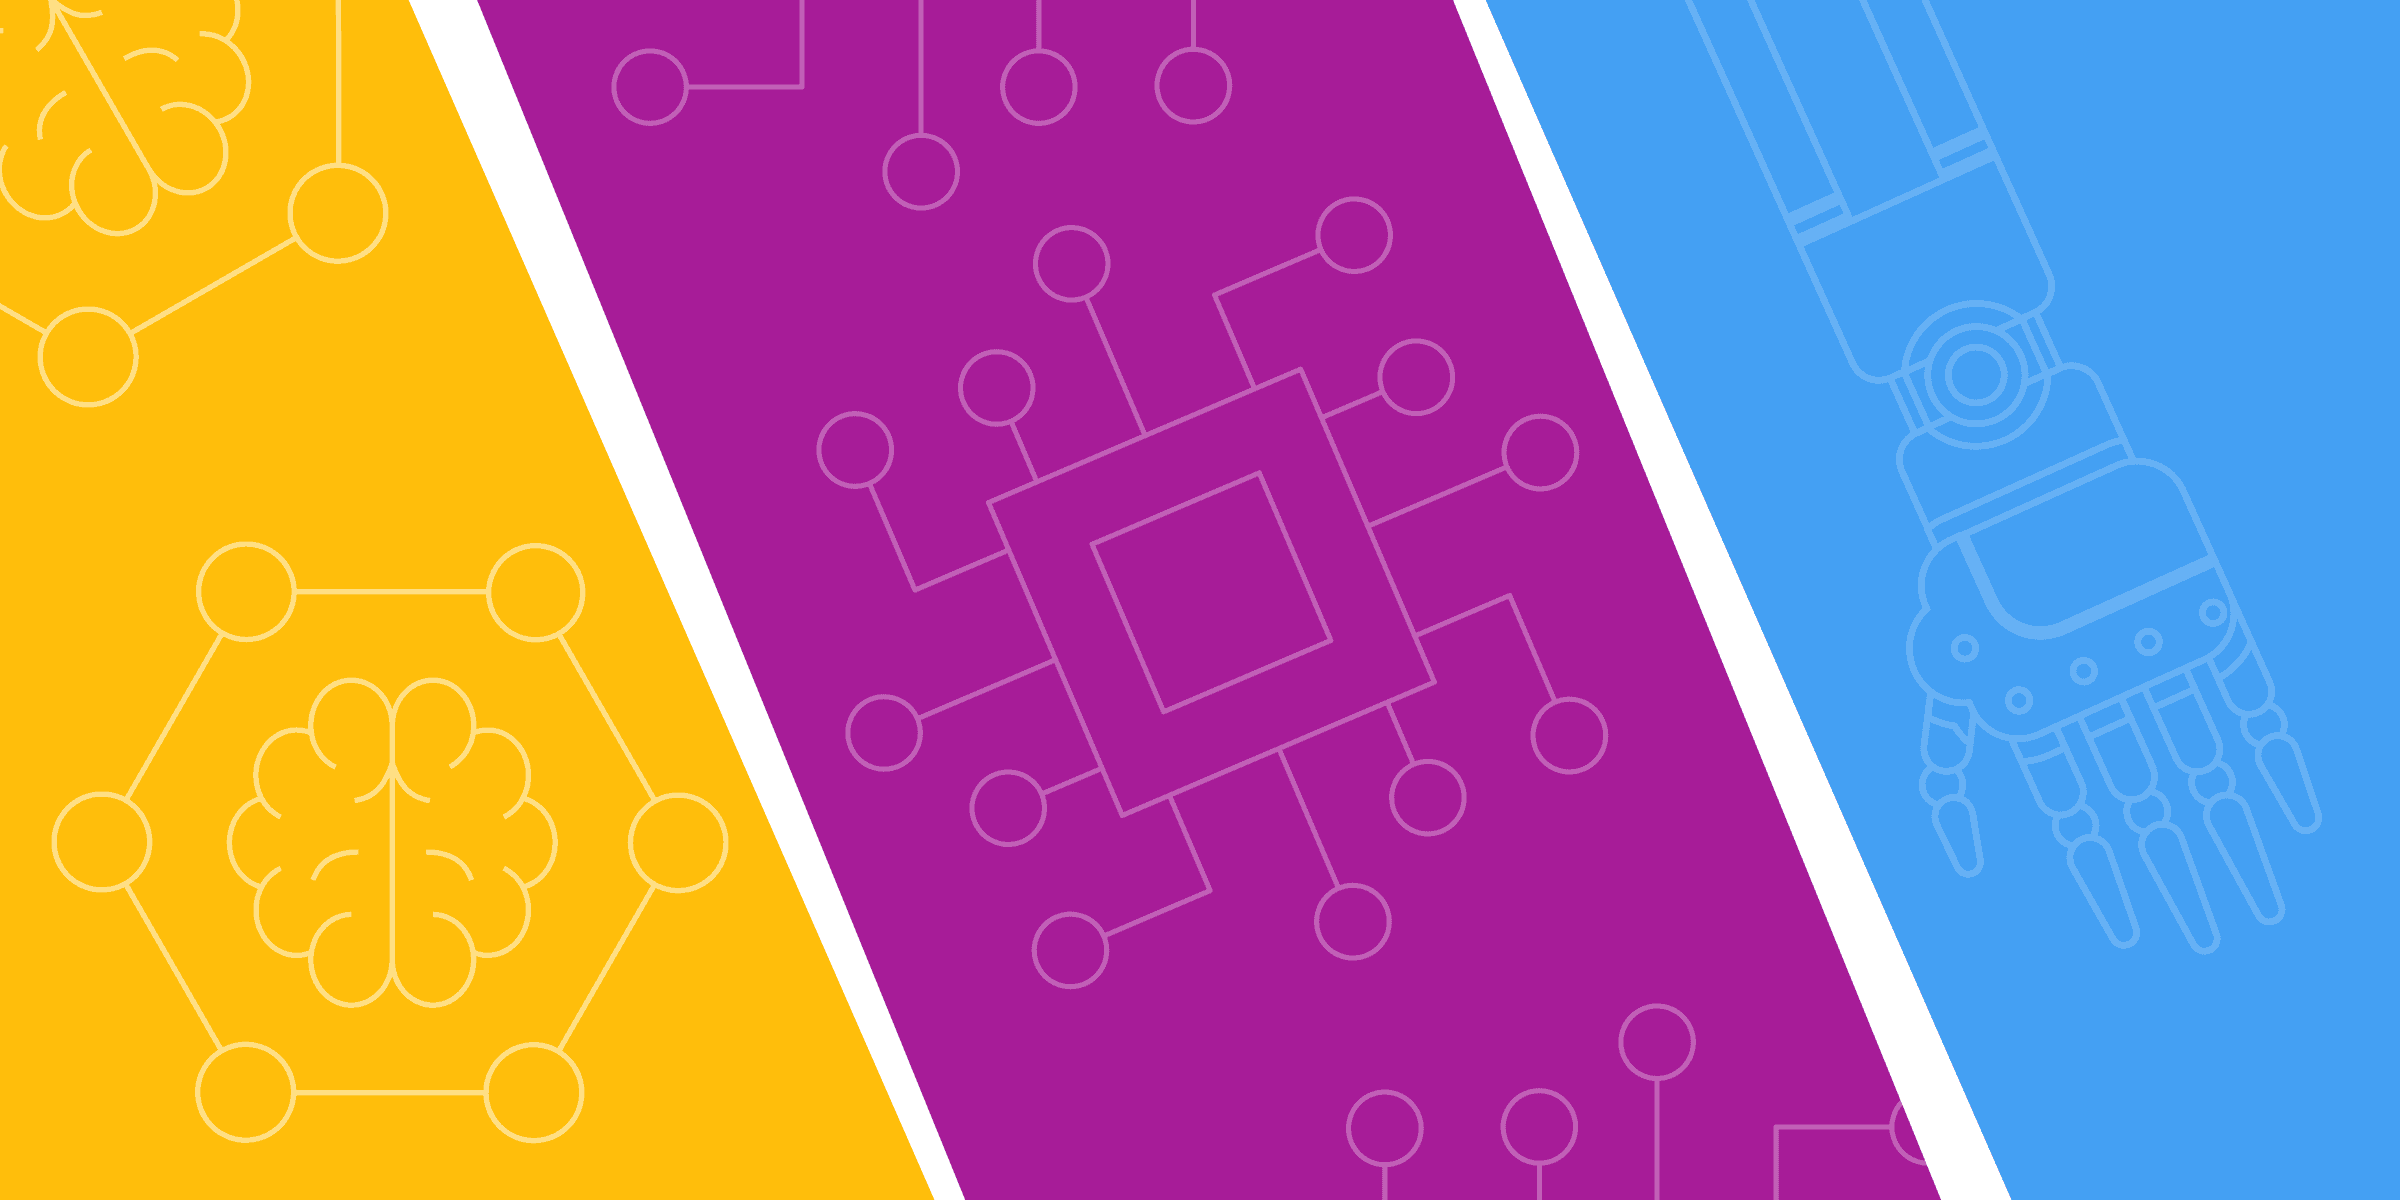 Illustration representing blockchain, robotics, and artificial intelligence